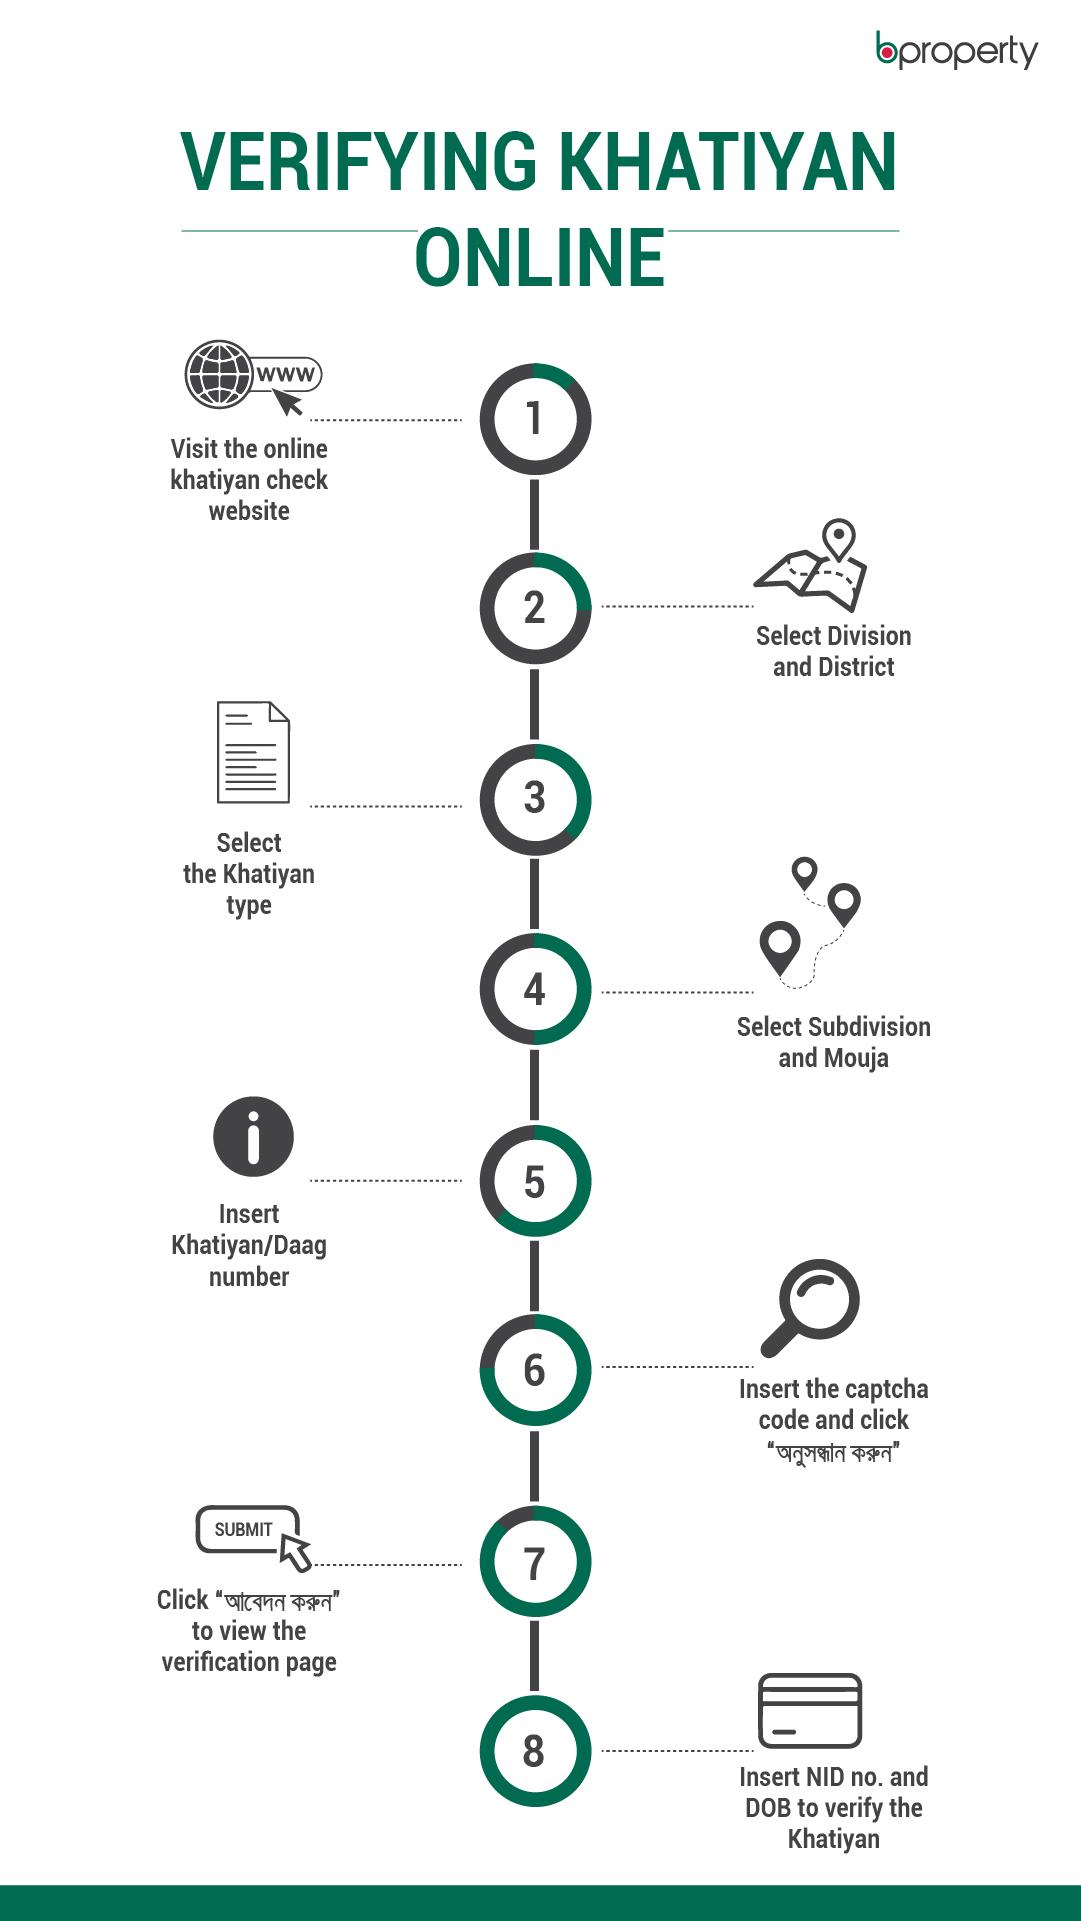 online khatiyan verification infographic